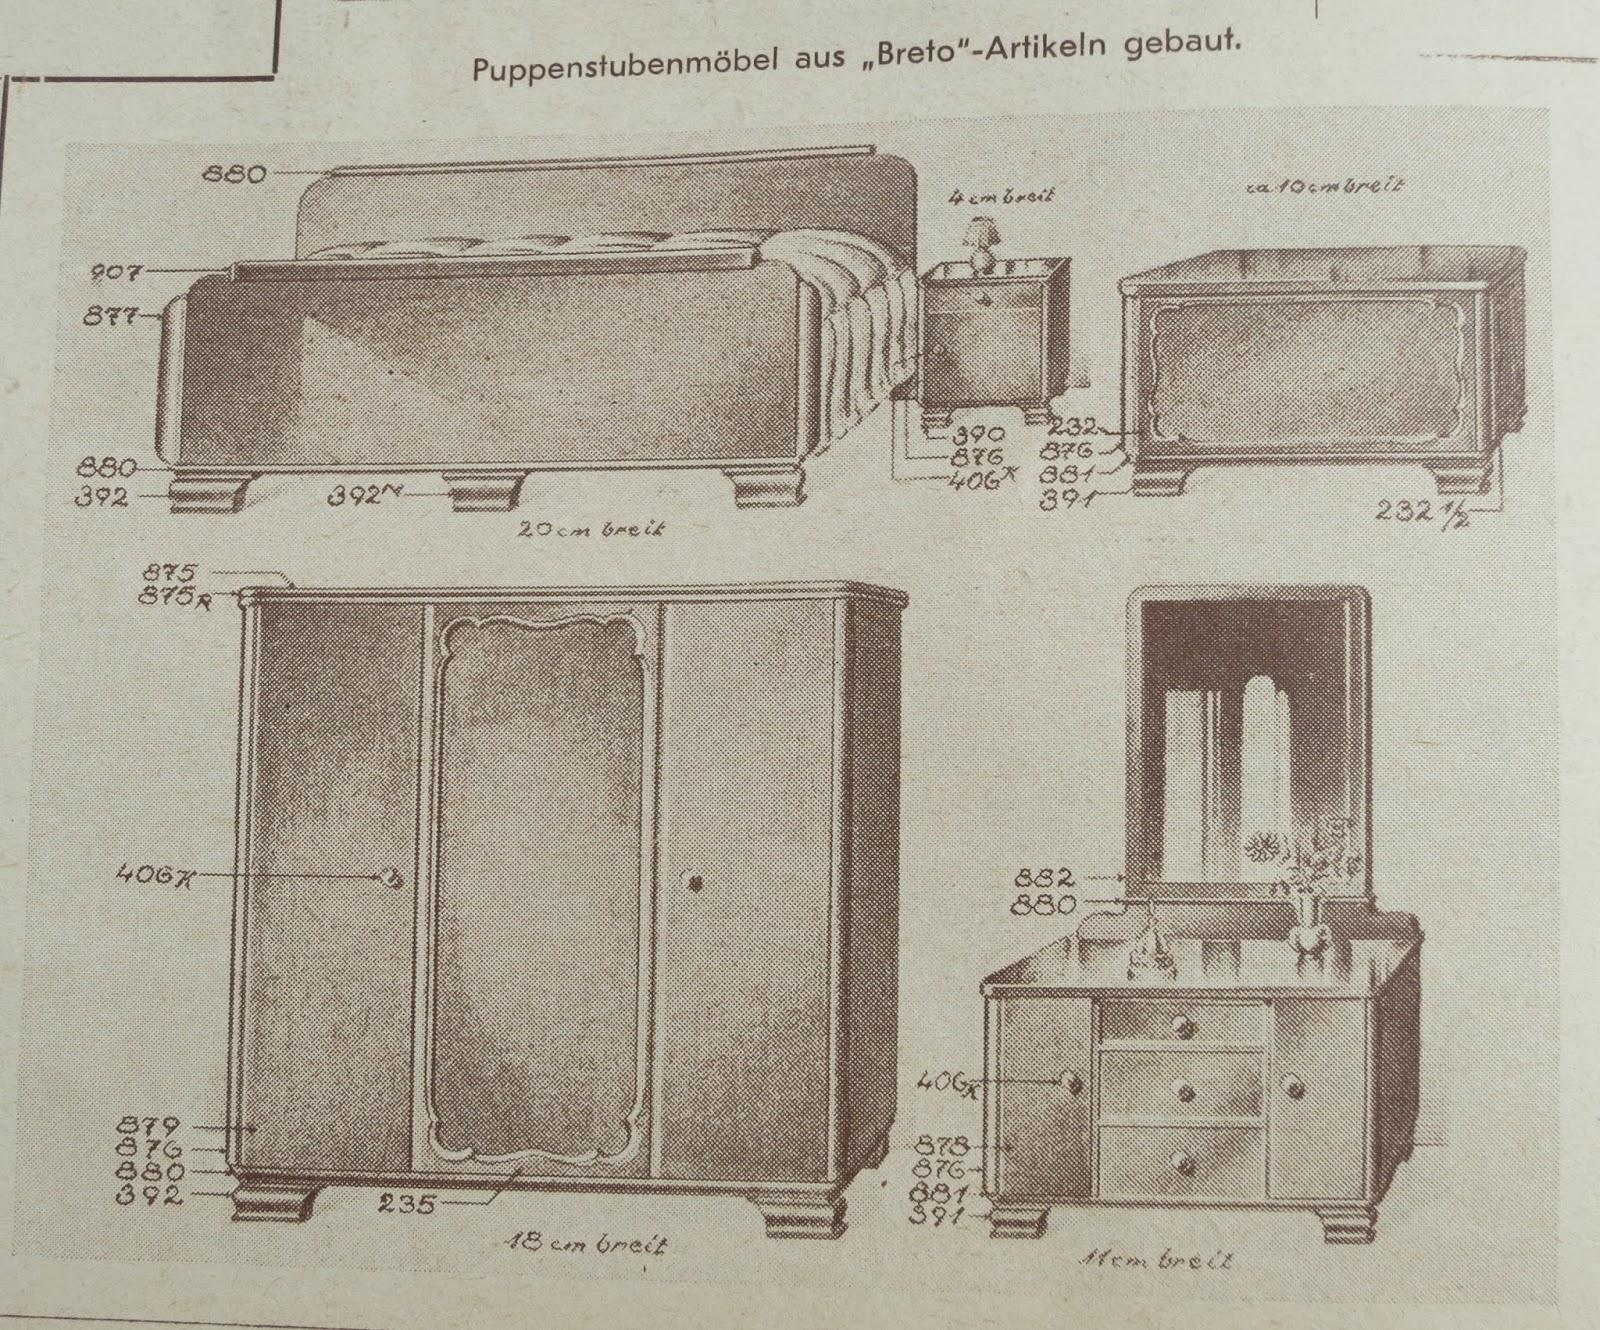 diepuppenstubensammlerin 1930er baumaterialien f r puppenh user 1930s diy dolls houses. Black Bedroom Furniture Sets. Home Design Ideas